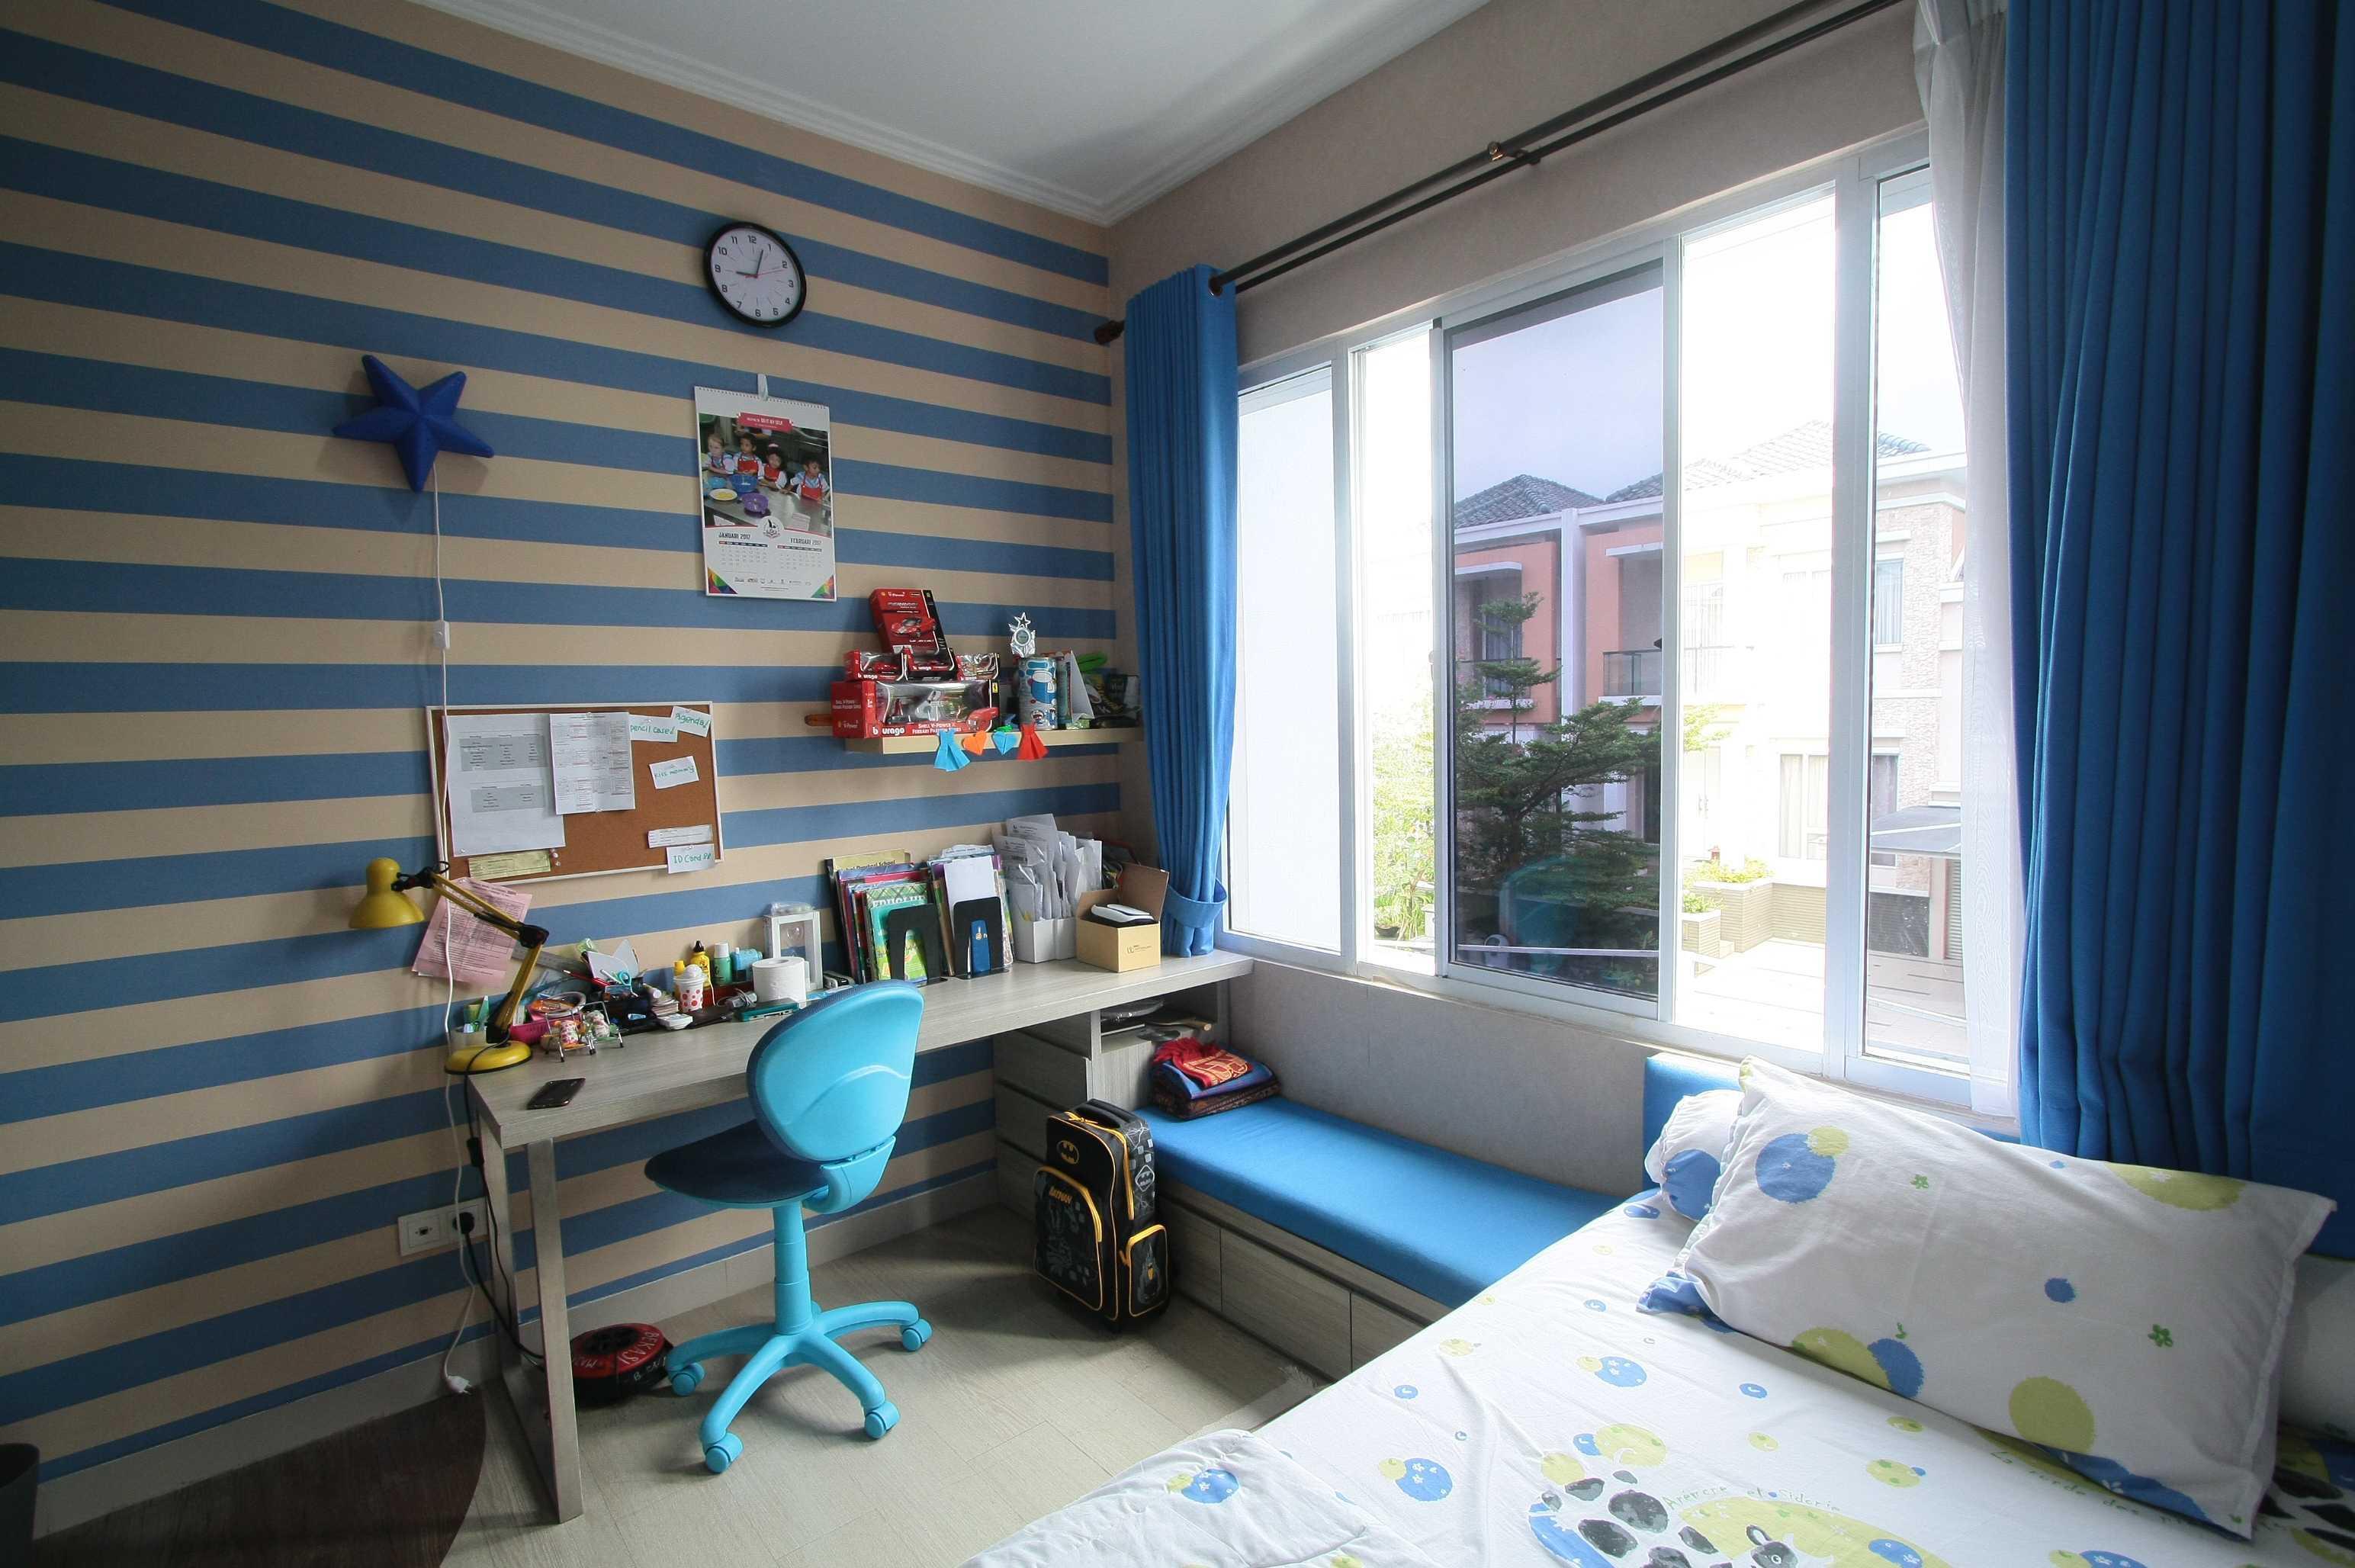 Exxo Interior Grand Galaxy Residence Bekasi Bekasi Boy Bedroom   28112